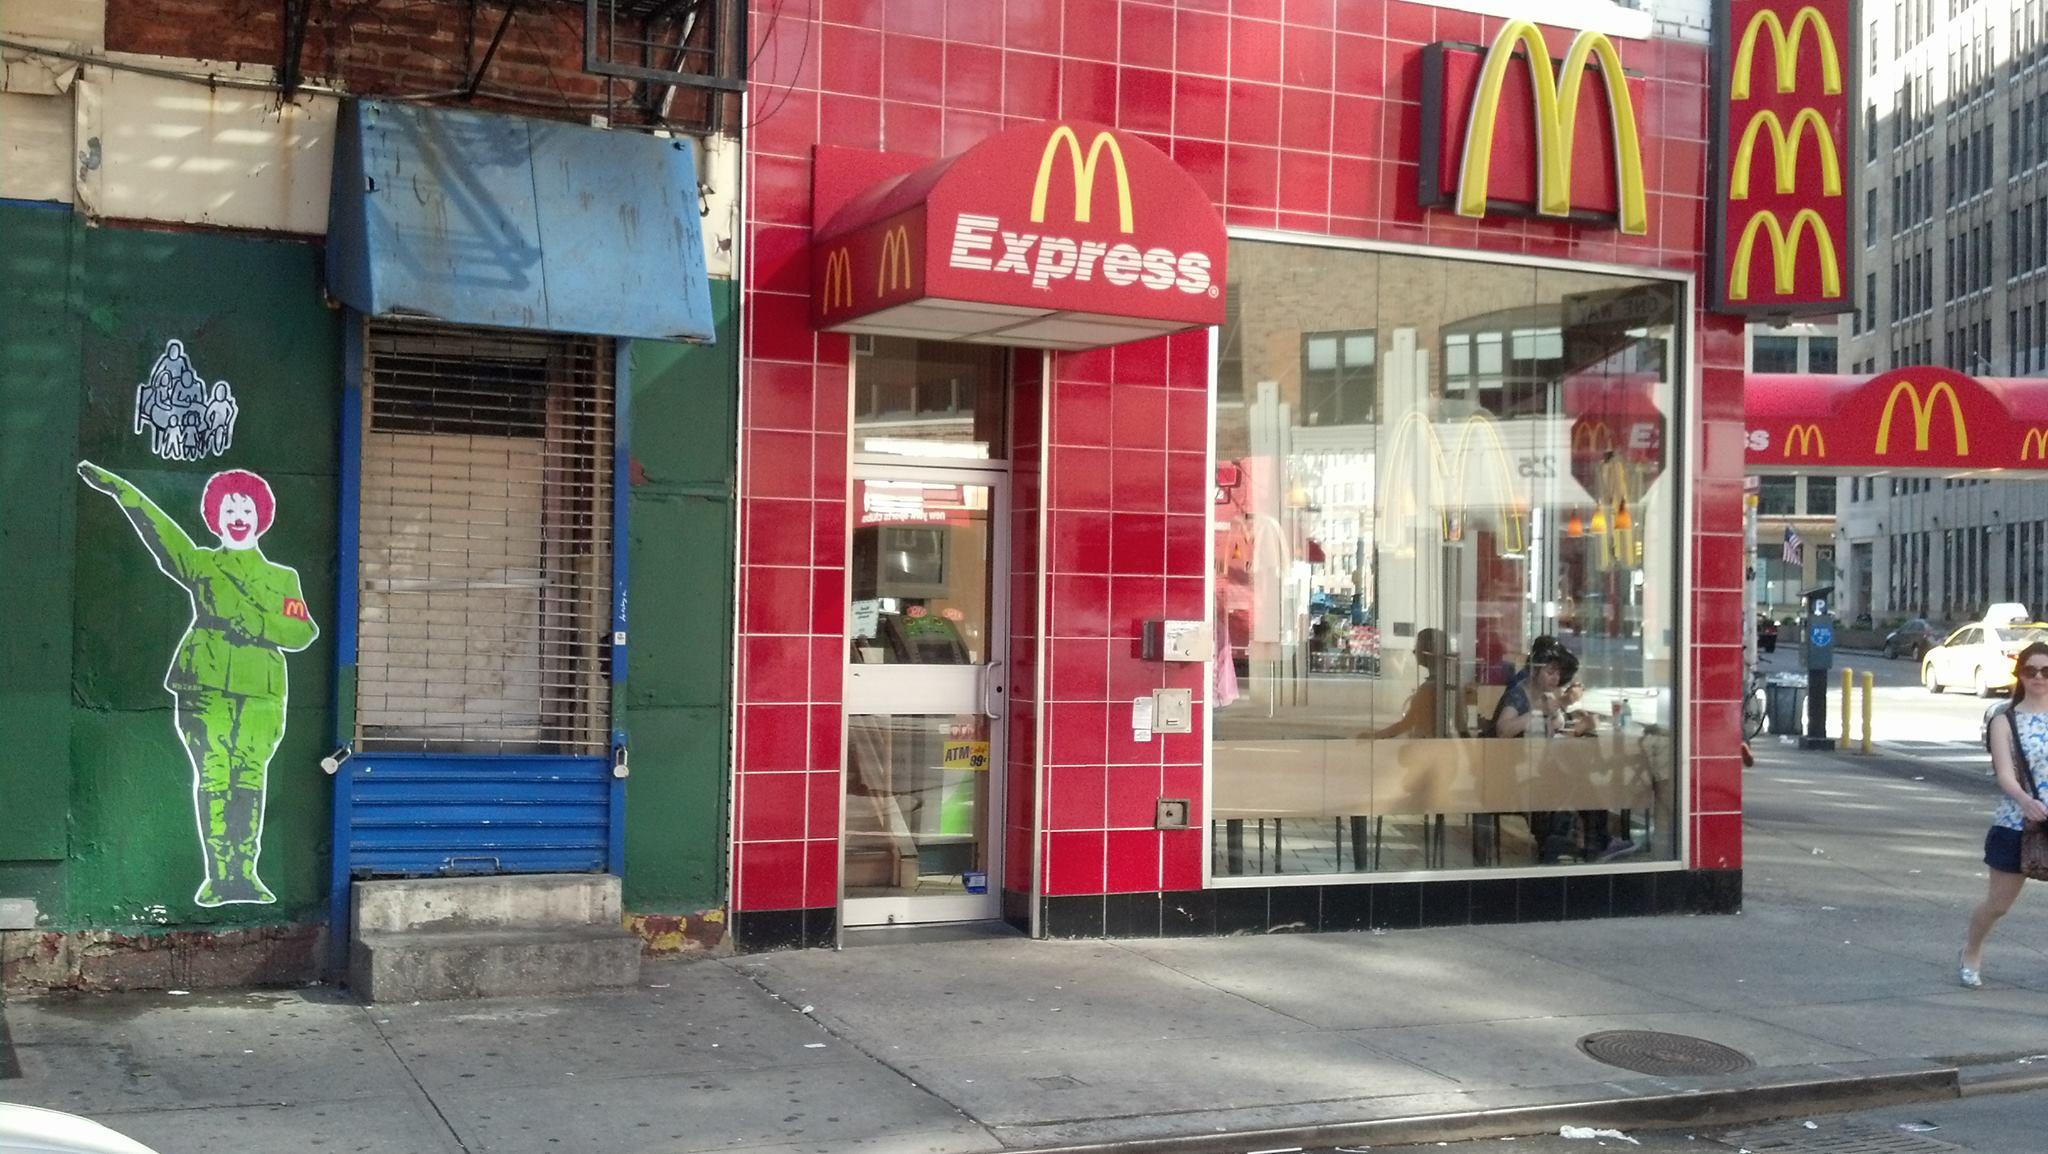 McDonalds Installation [West Village, NYC]